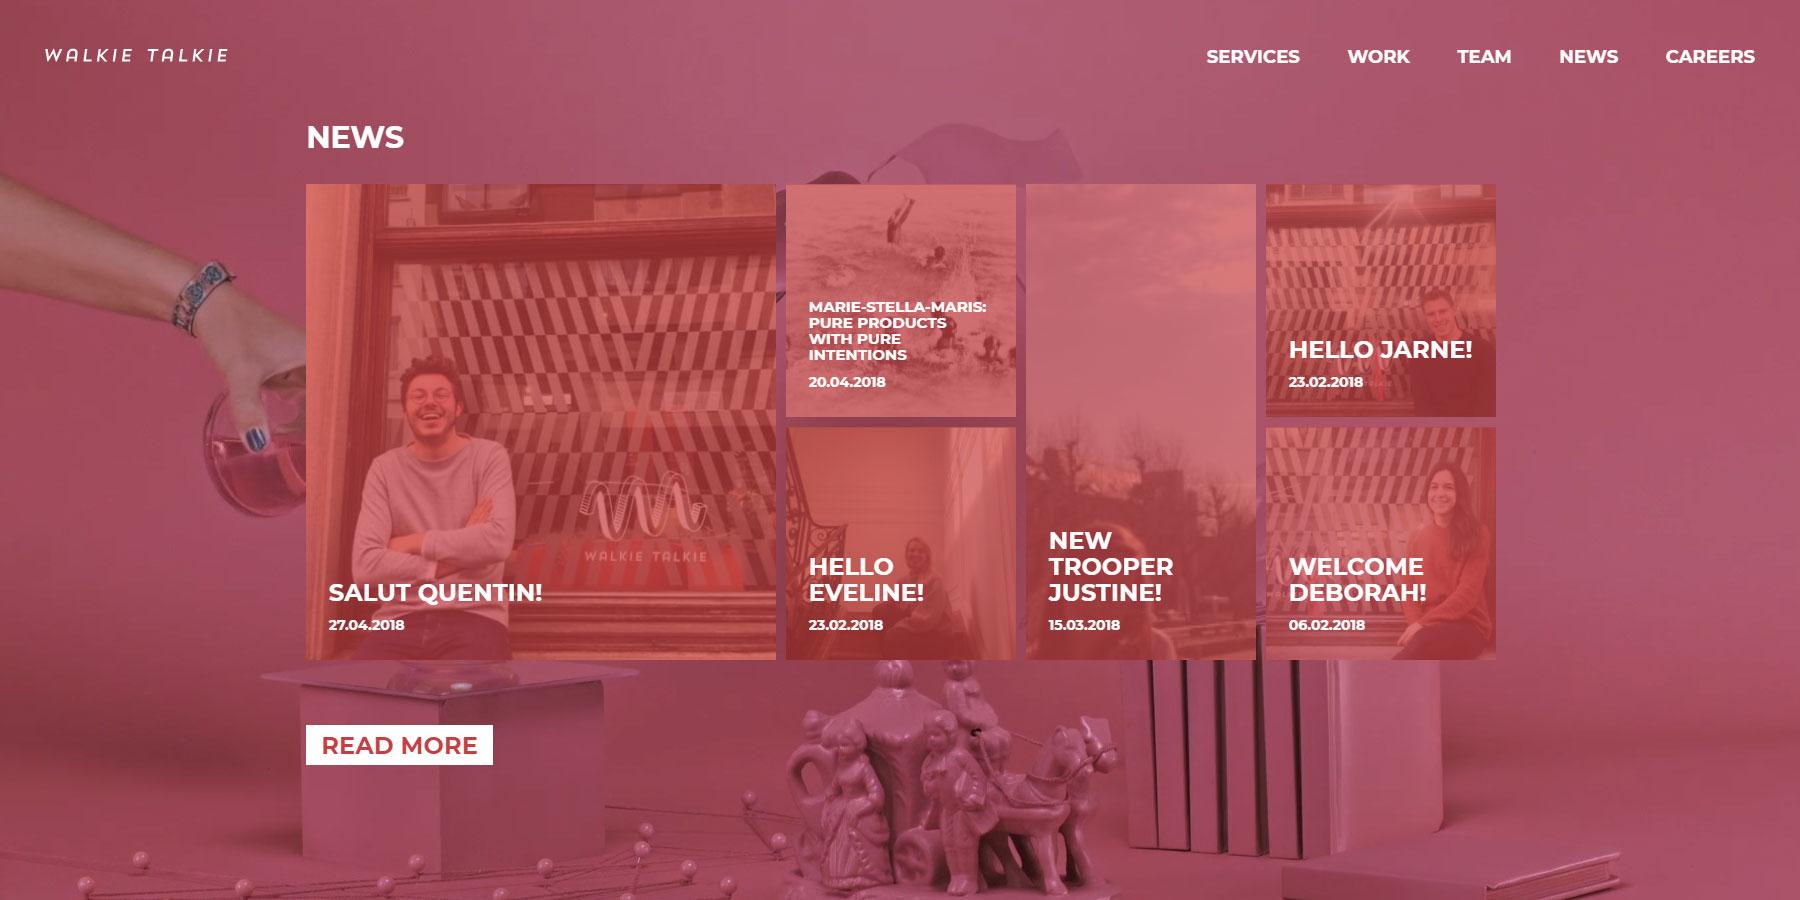 Walkie Talkie - Website of the Day